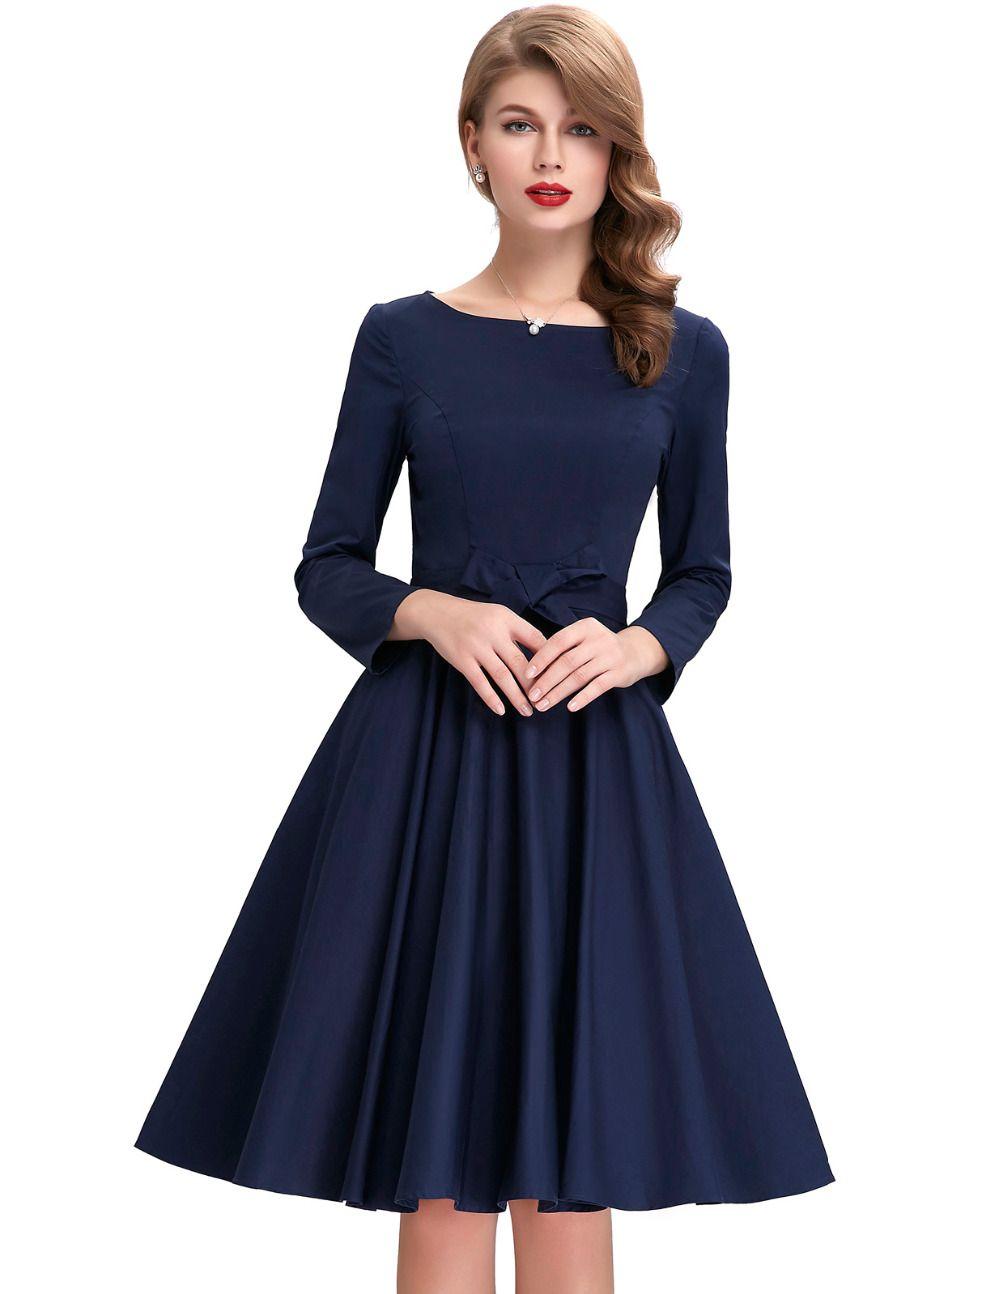 Cotton long sleeve s rockabilly dresses autumn retro